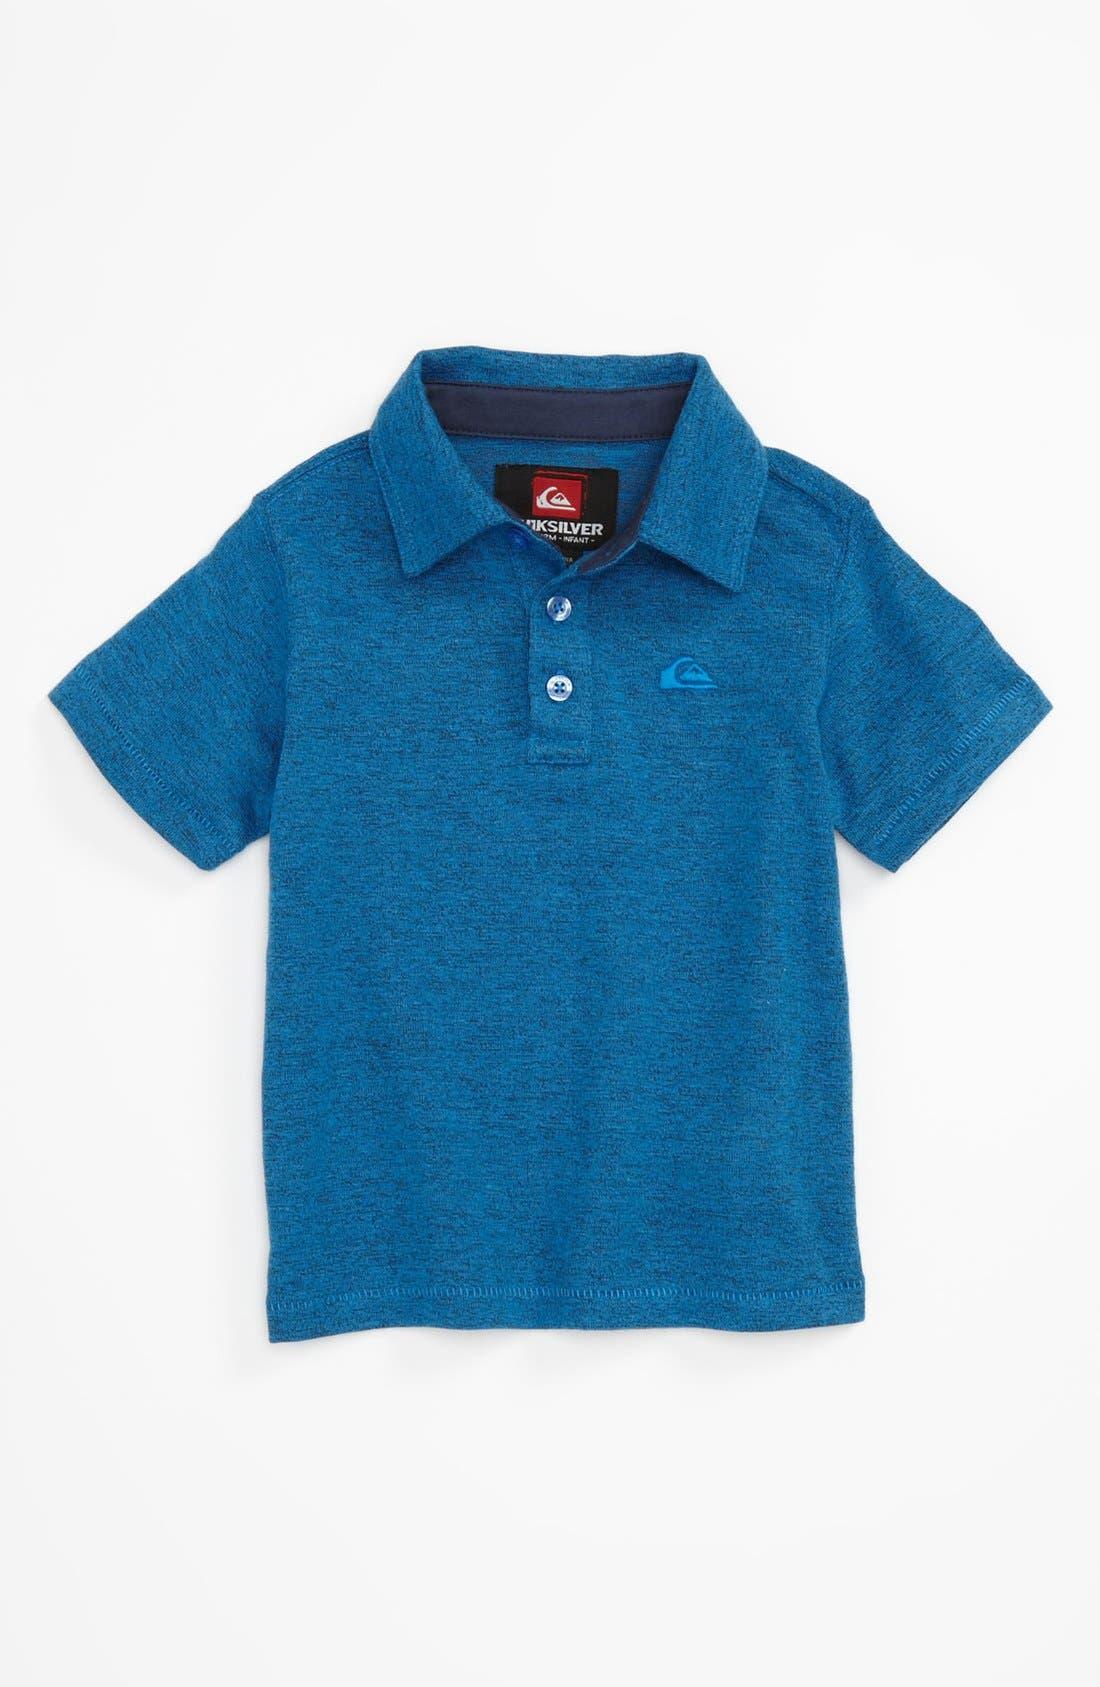 Main Image - Quiksilver 'Grab Bag' Polo Shirt (Toddler)